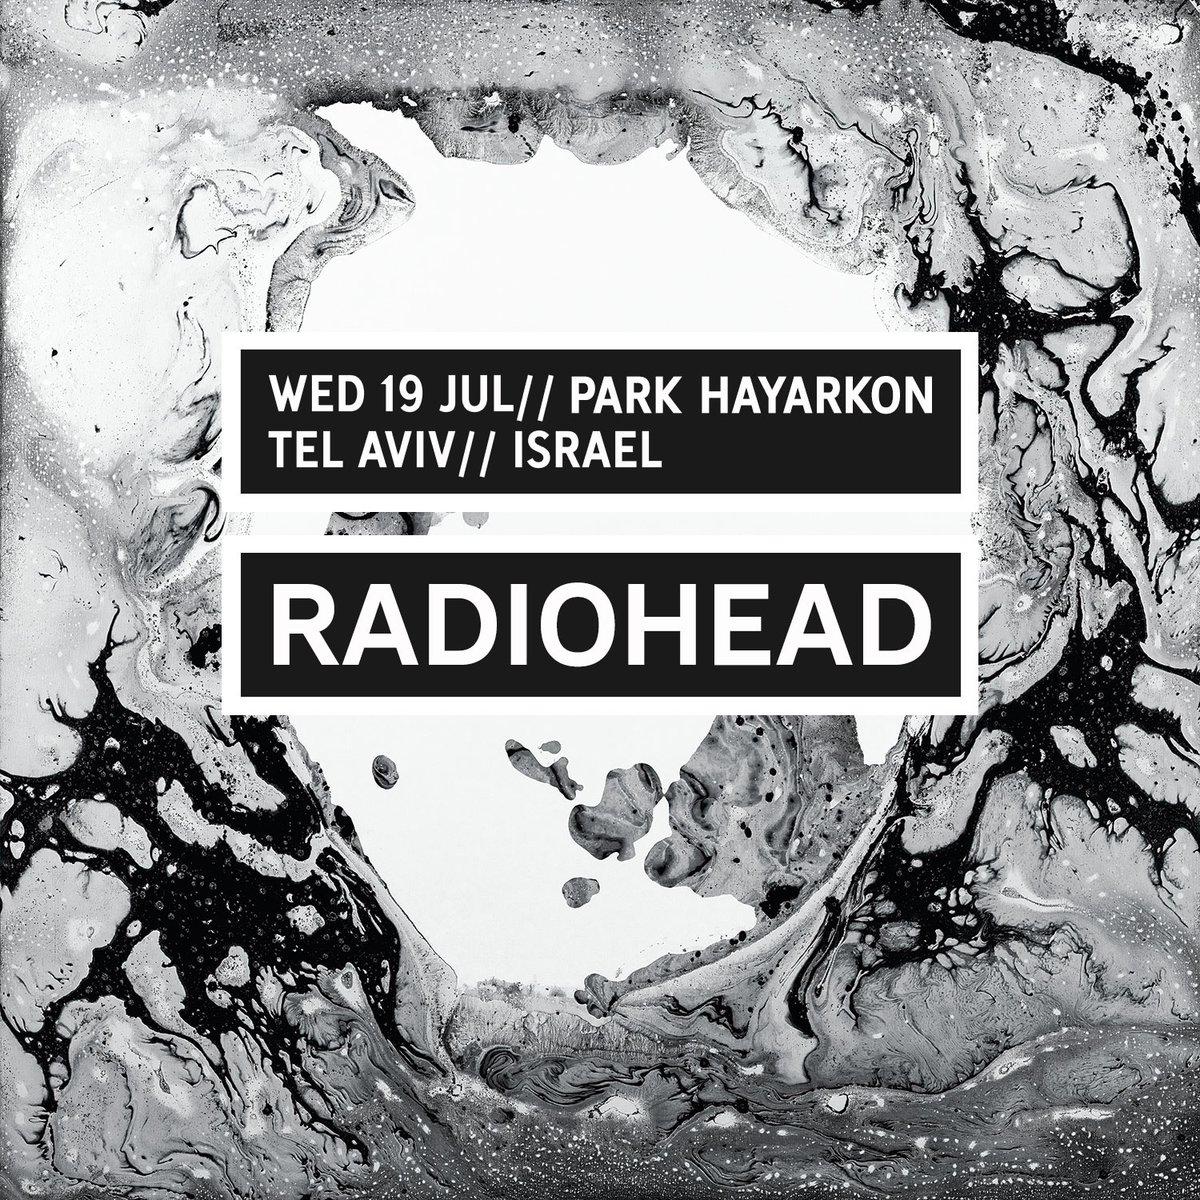 Radioheads to Israel